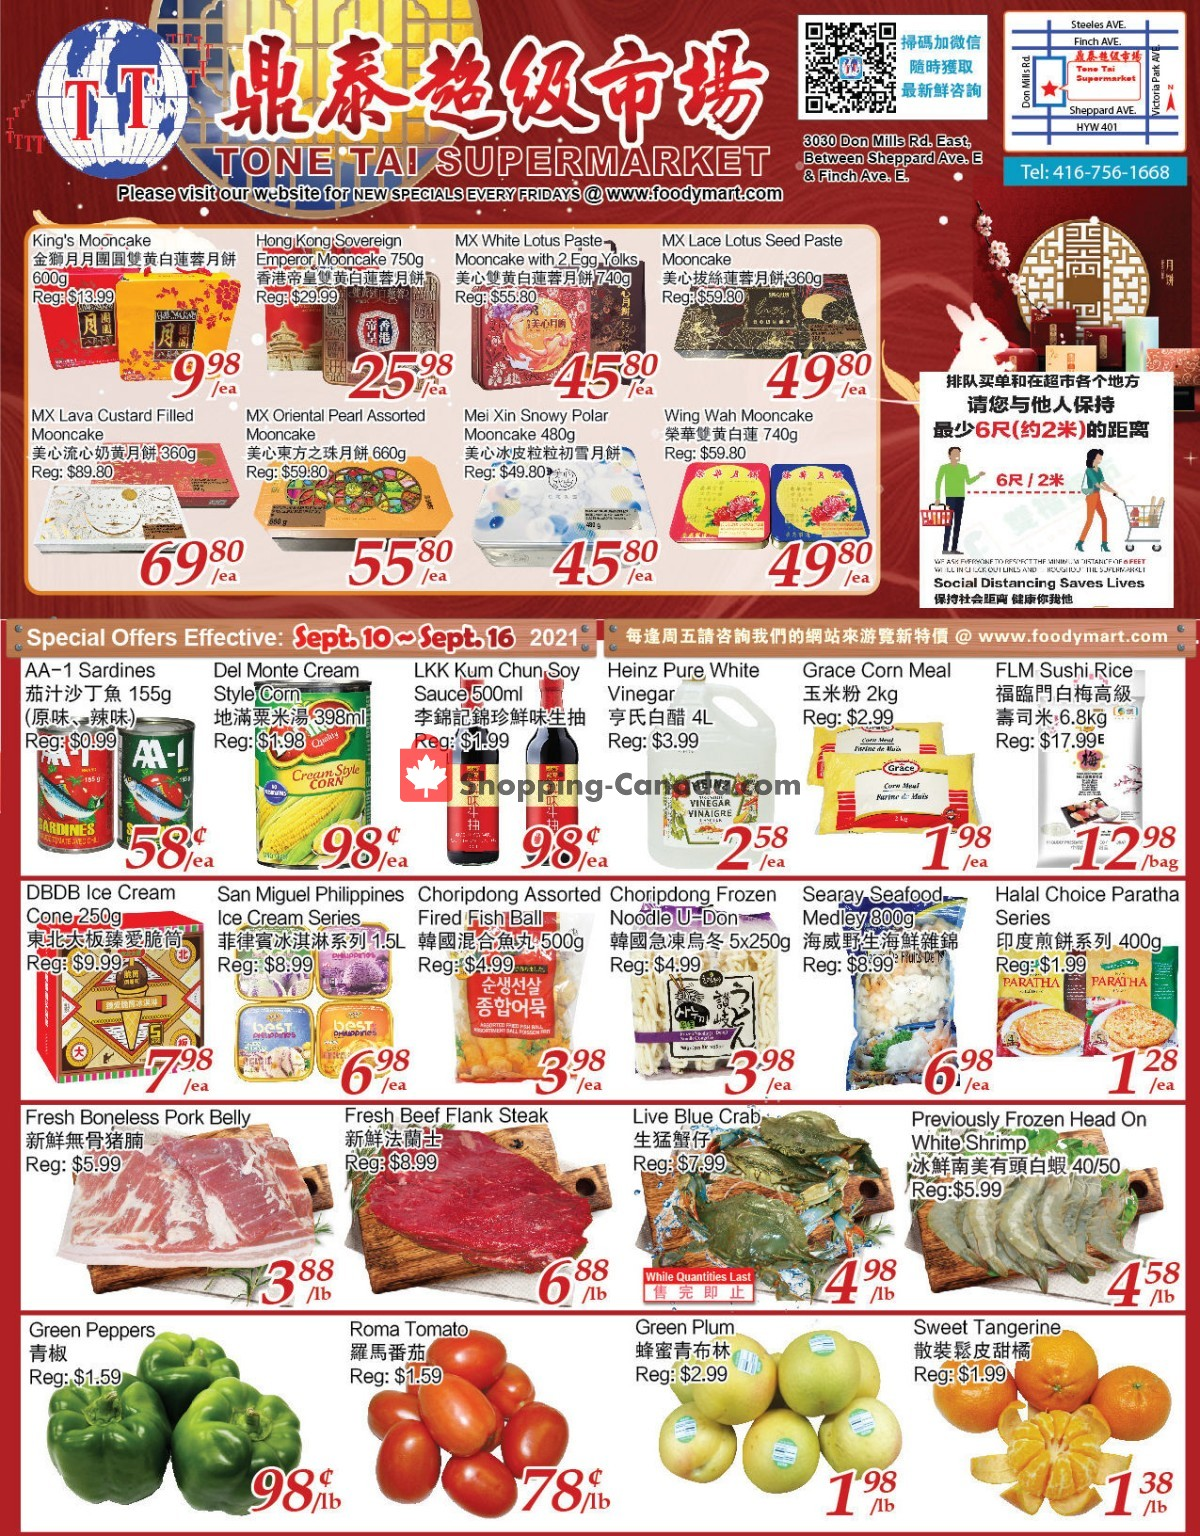 Flyer Tone Tai Supermarket Canada - from Friday September 10, 2021 to Thursday September 16, 2021